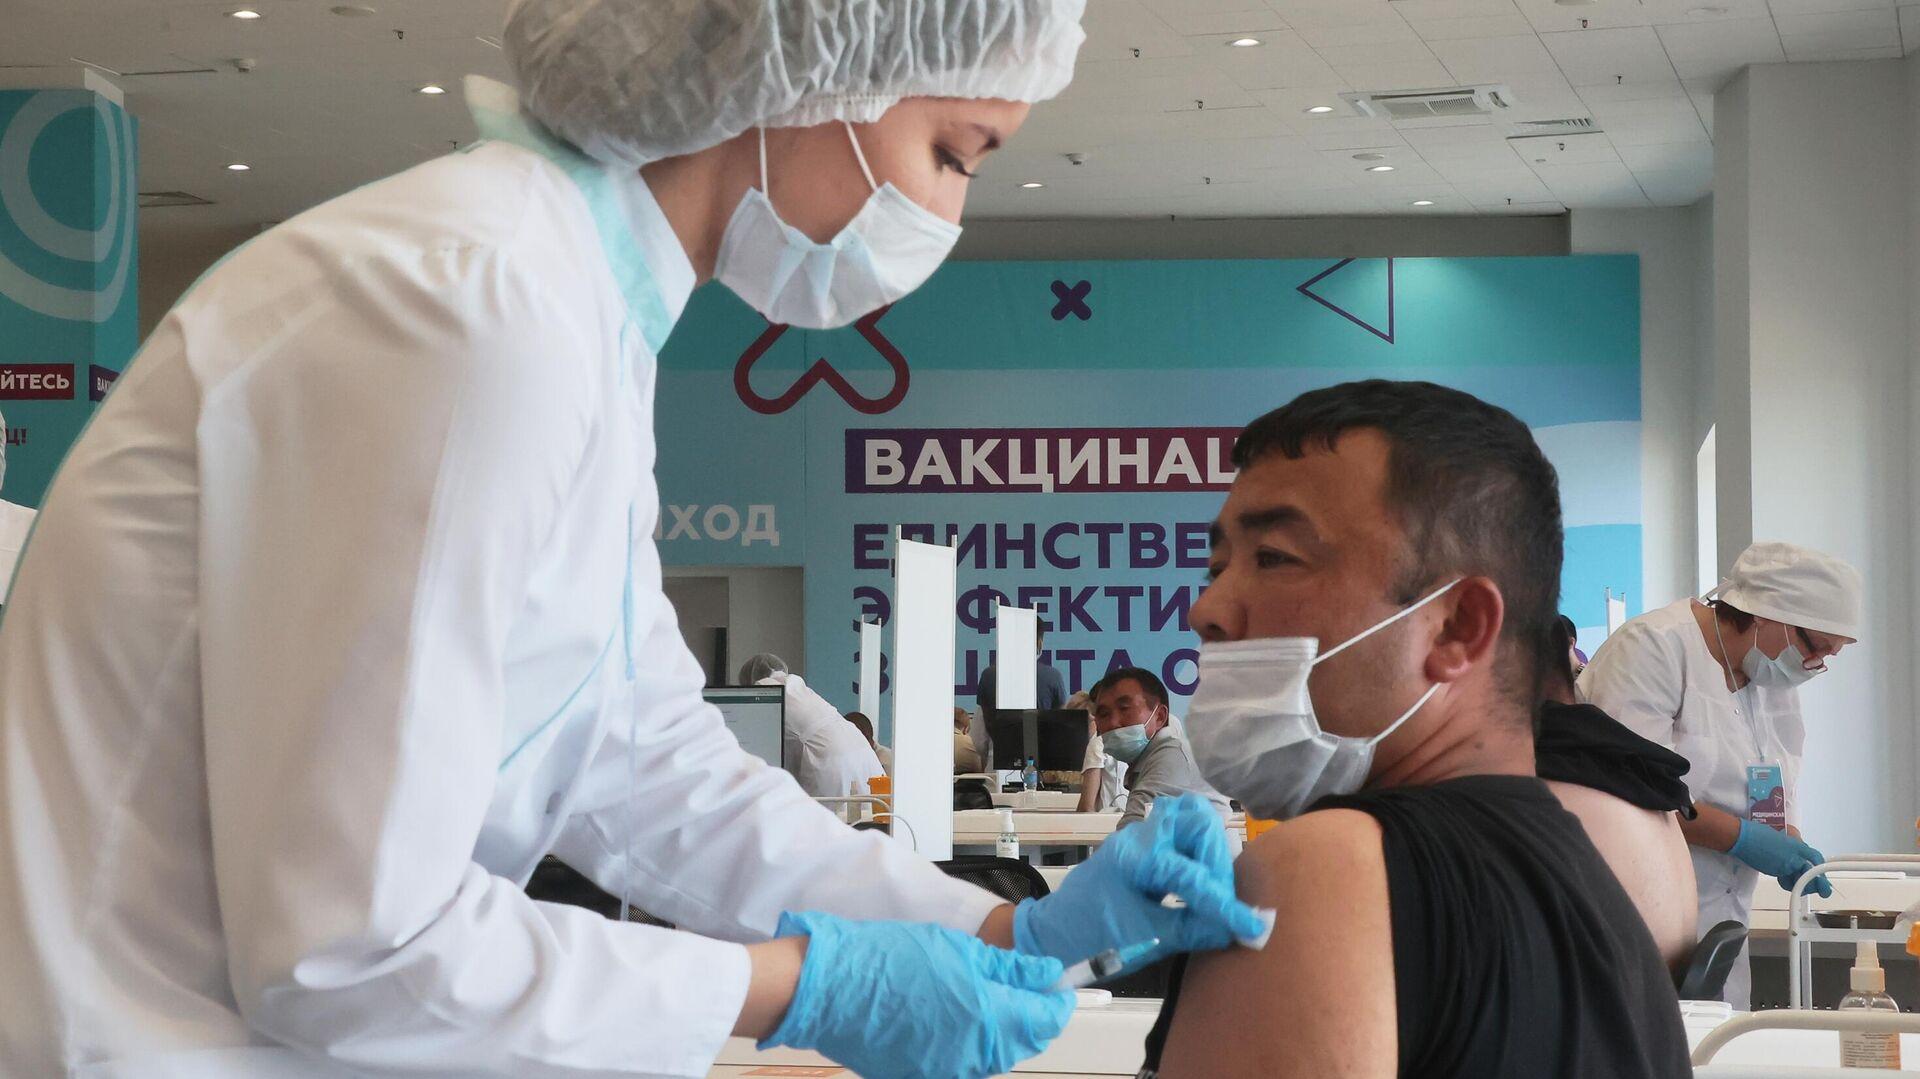 Центр вакцинации от COVID-19 в Лужниках - Sputnik Таджикистан, 1920, 09.07.2021